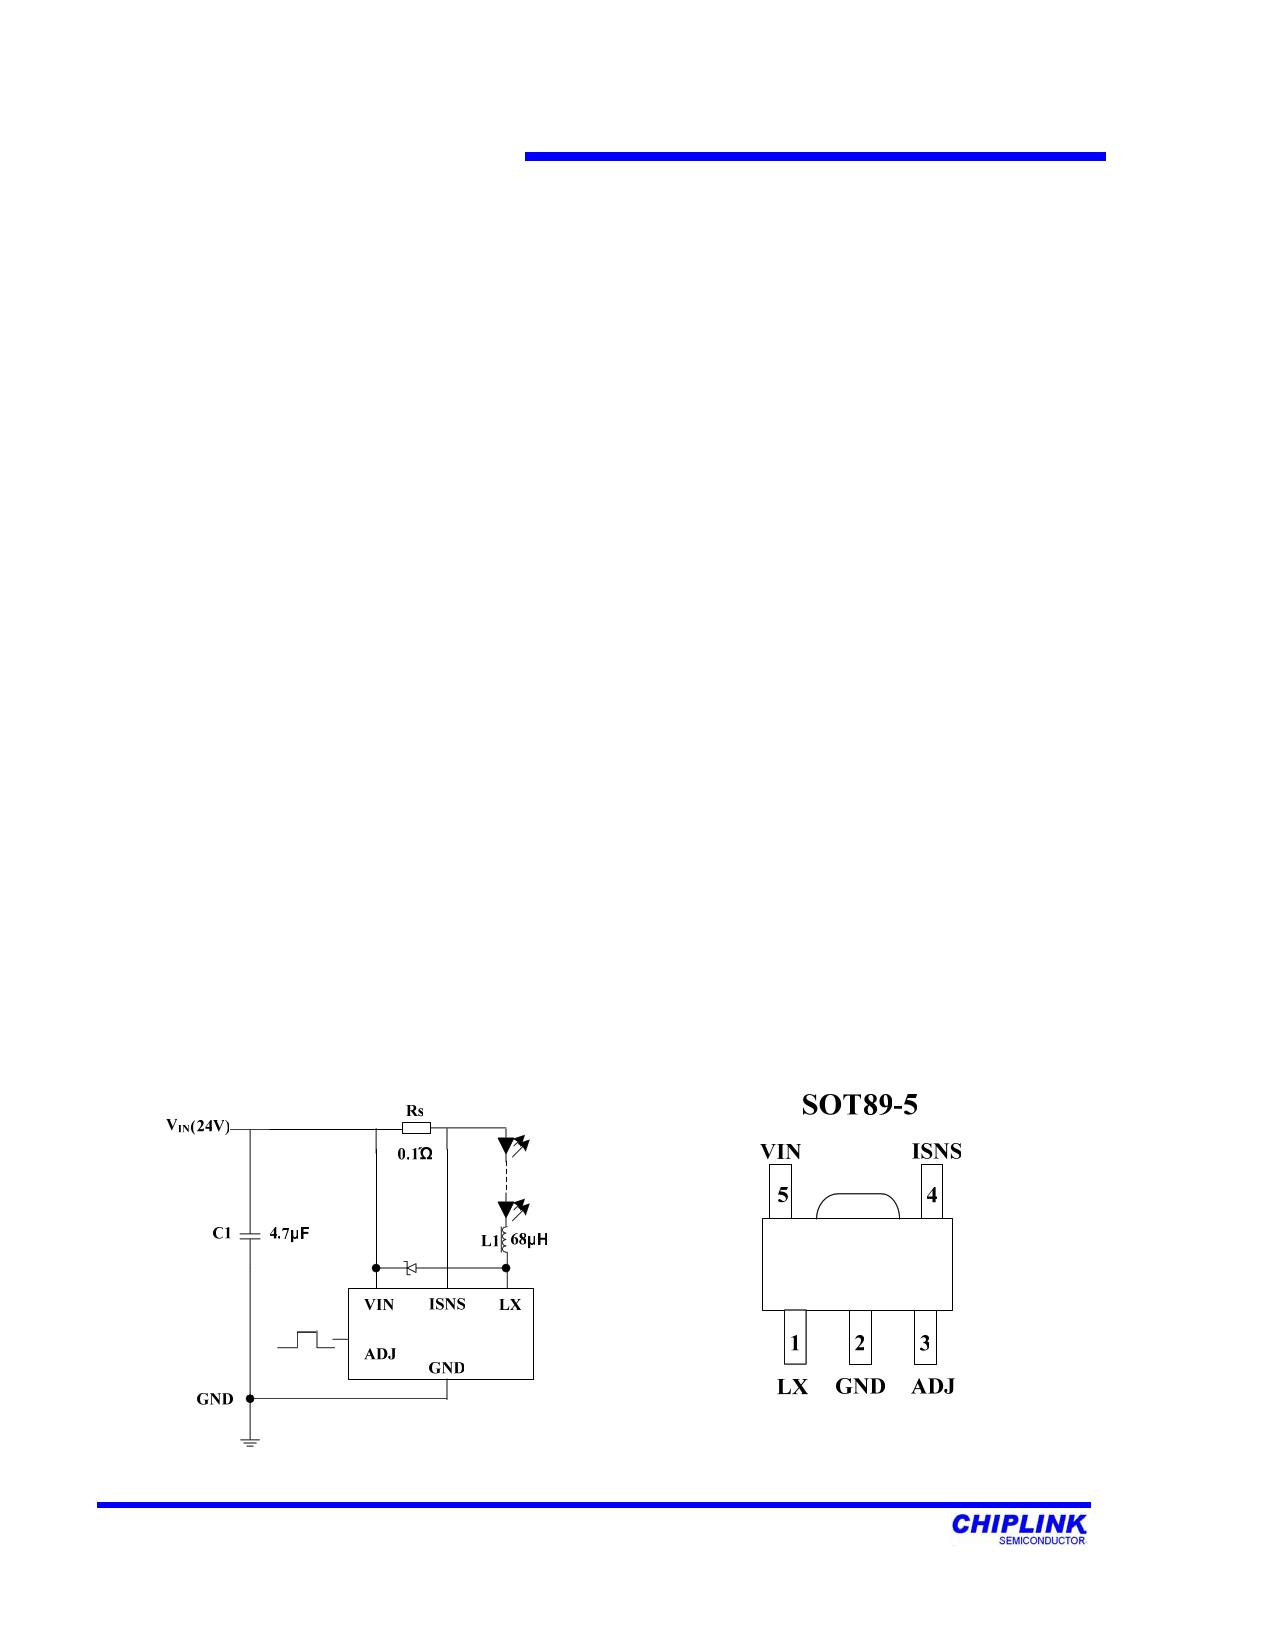 CL6808 datasheet pinout